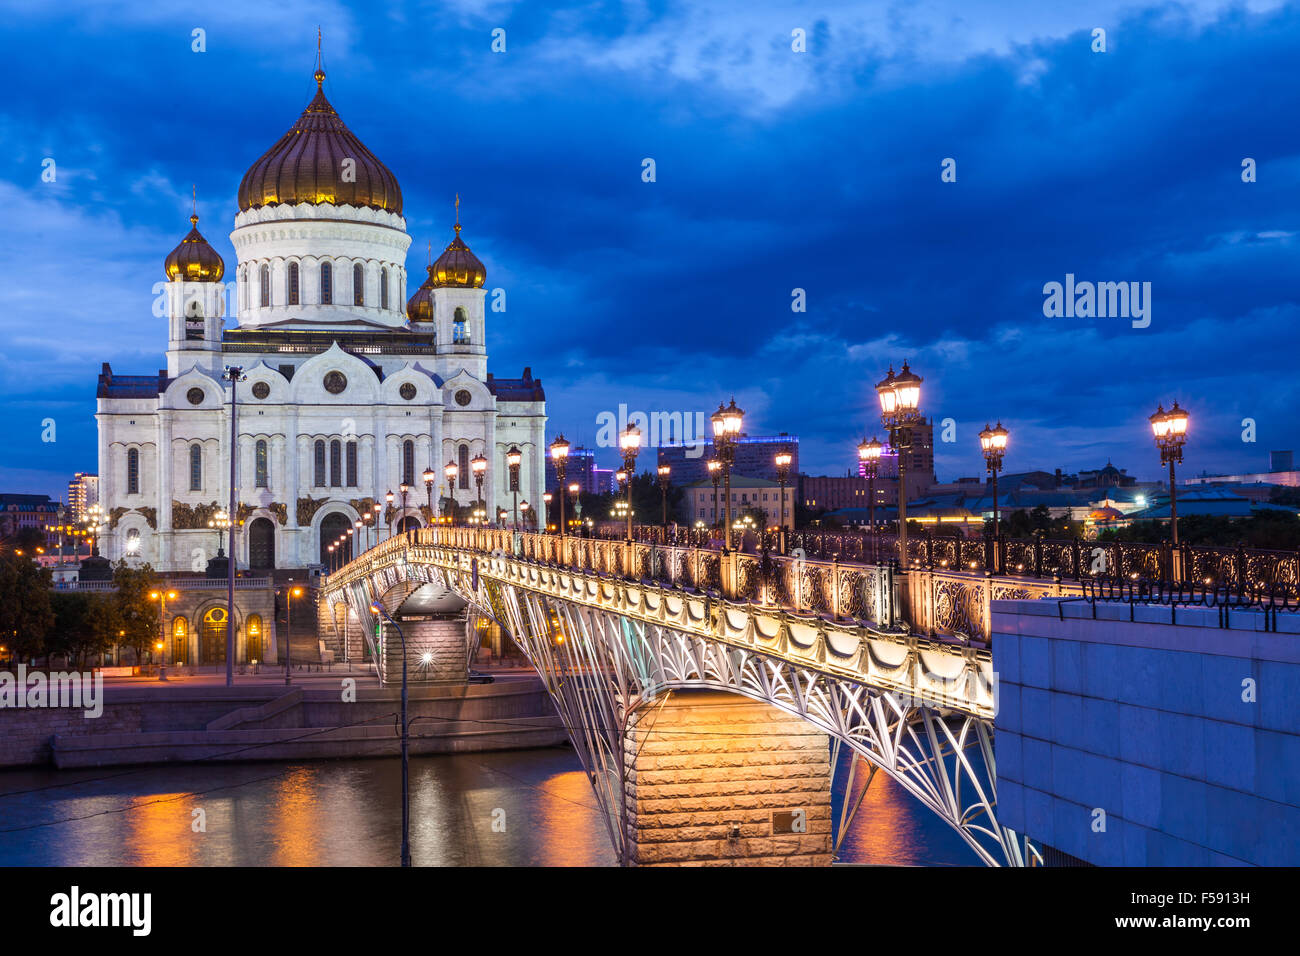 La Catedral de Cristo Salvador de Moscú, Rusia. Imagen De Stock